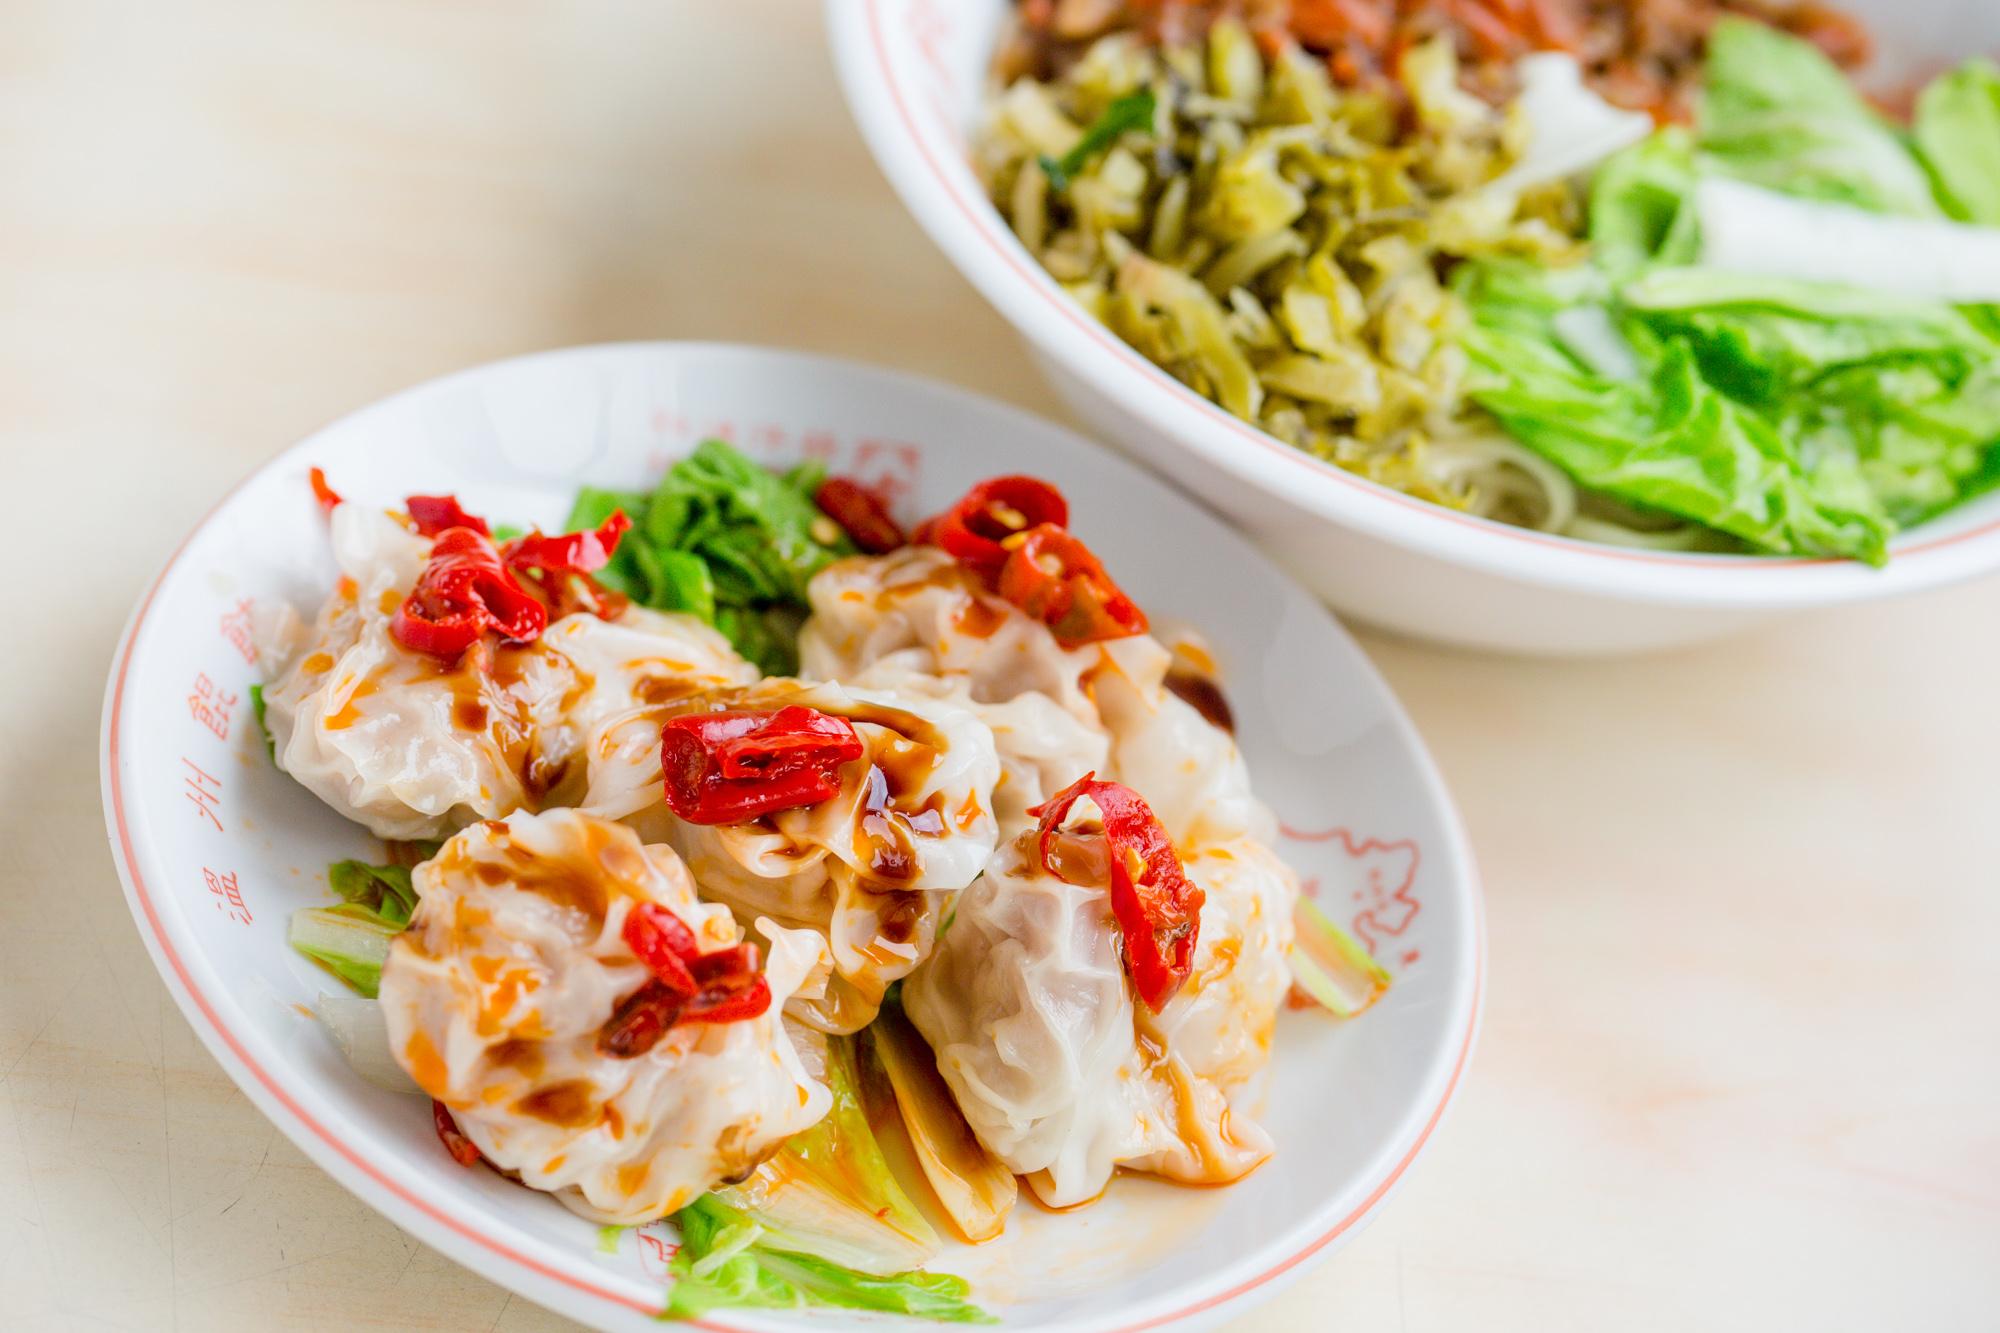 Combo H: Noodles with Pork, Potatoes & Carrots + Sichuan Style Wontons